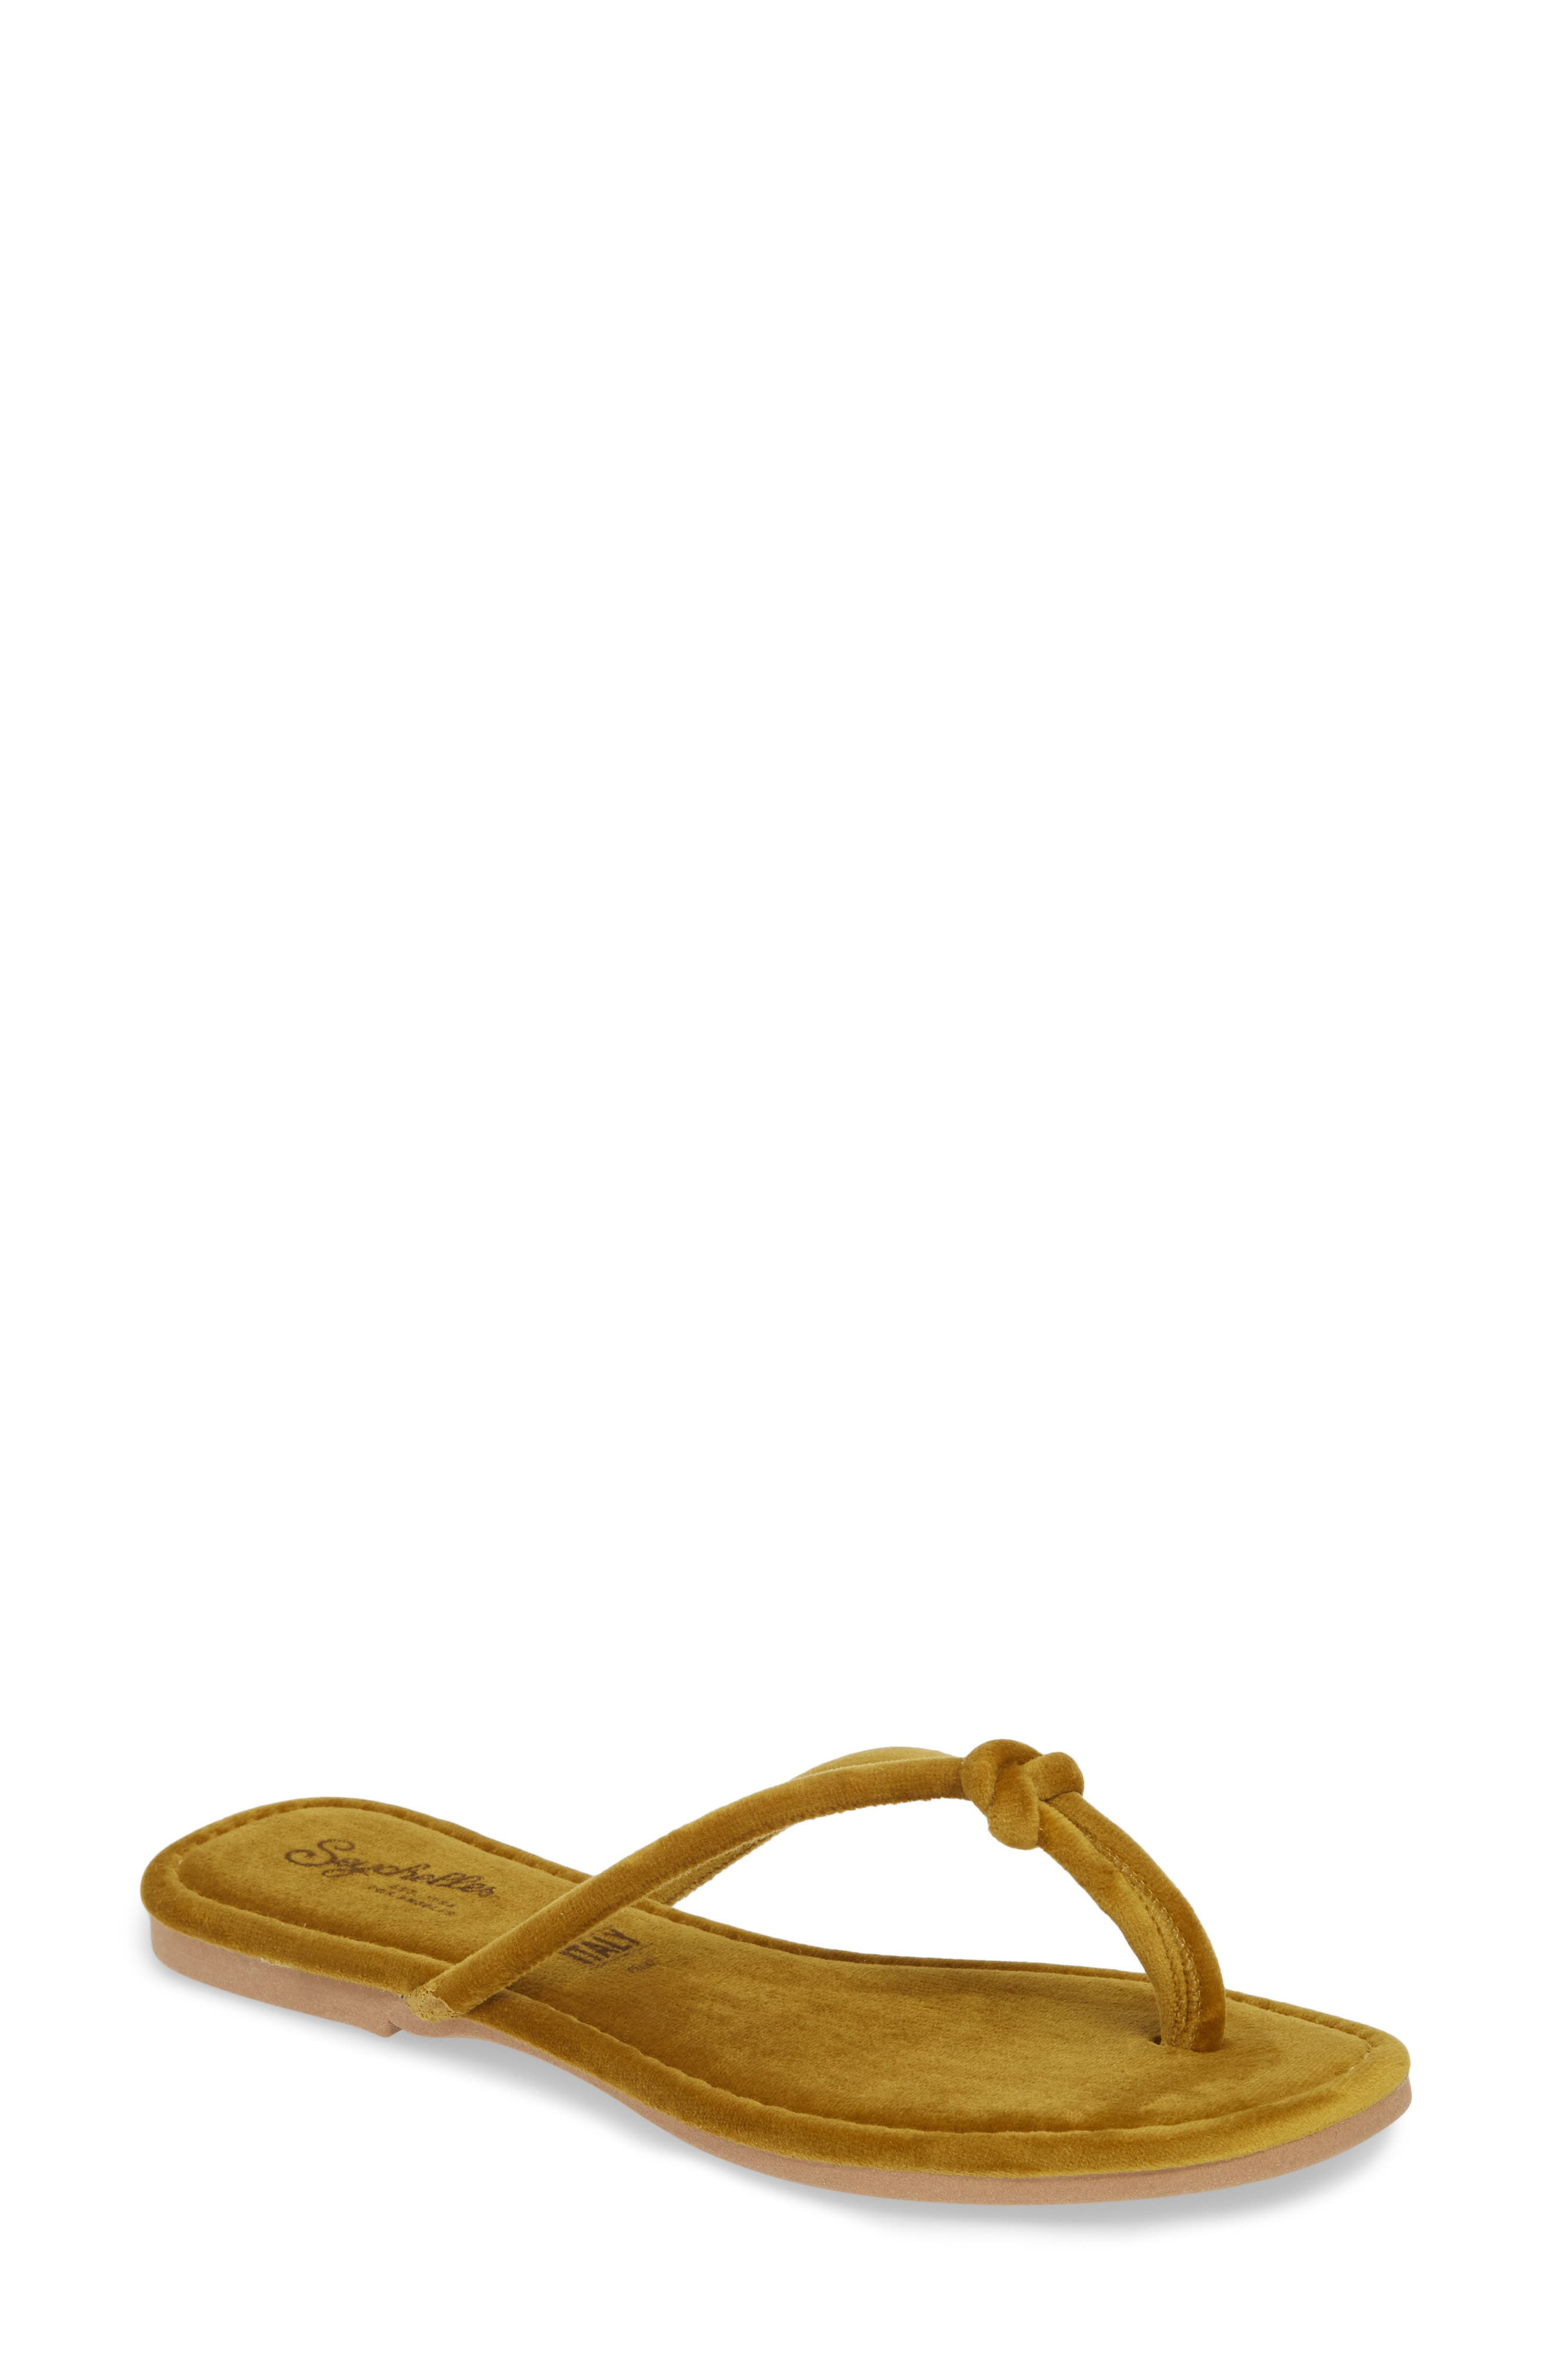 Seychelles Lifelong Flip Flop, Yellow